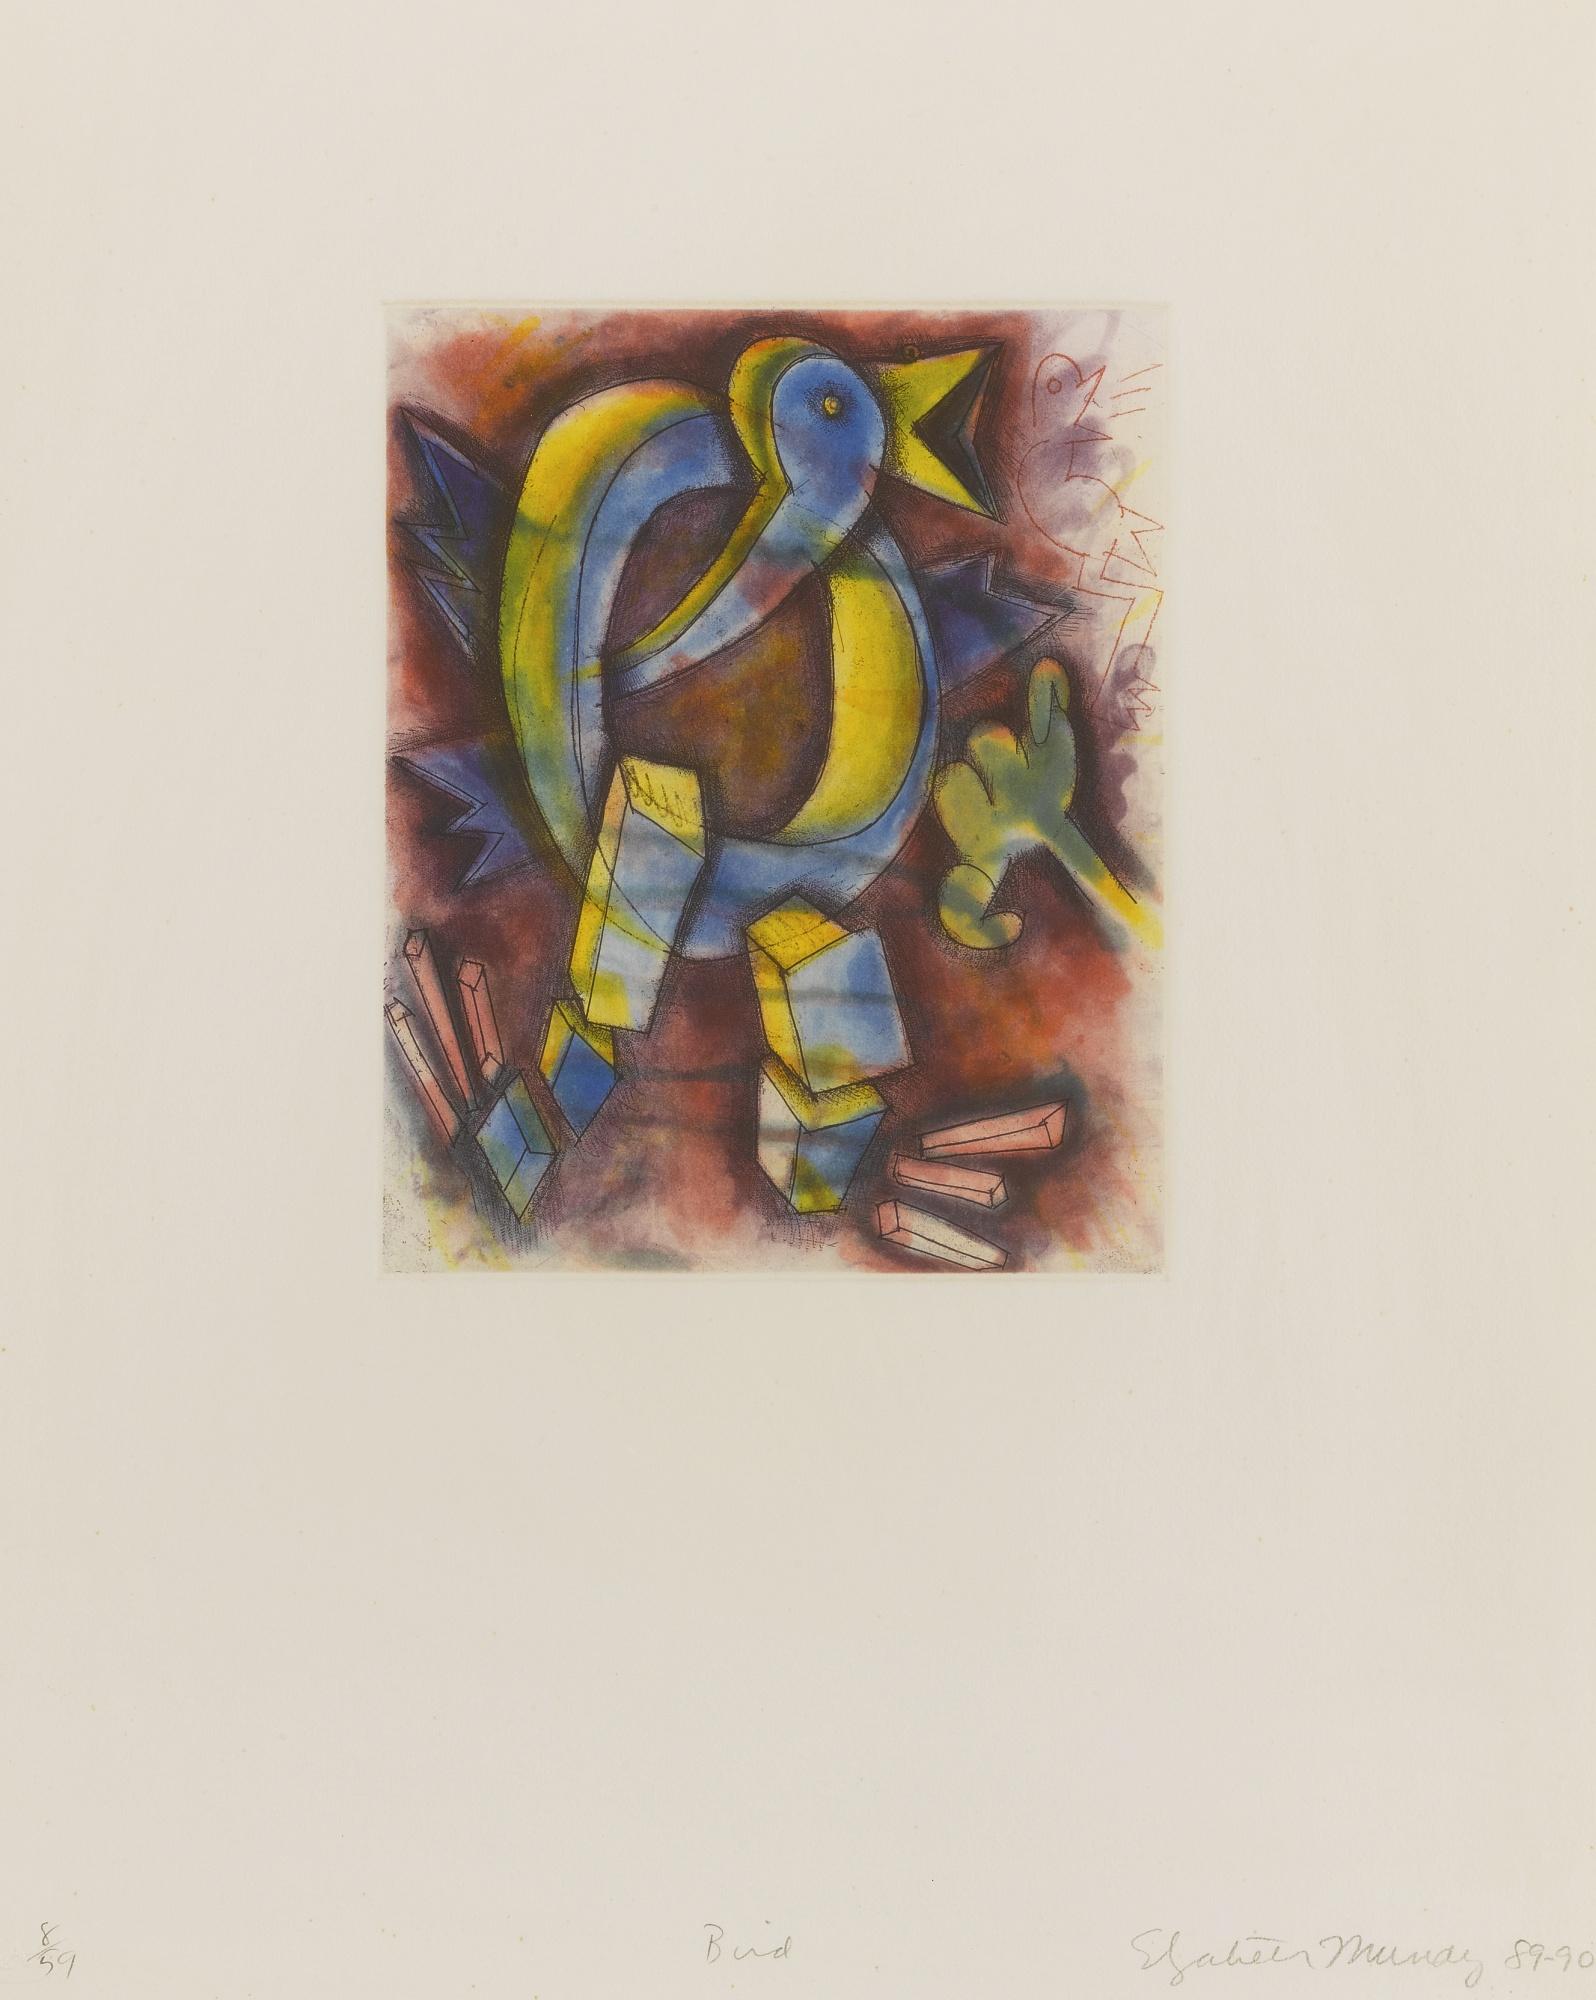 Elizabeth Murray-Quartet-1990